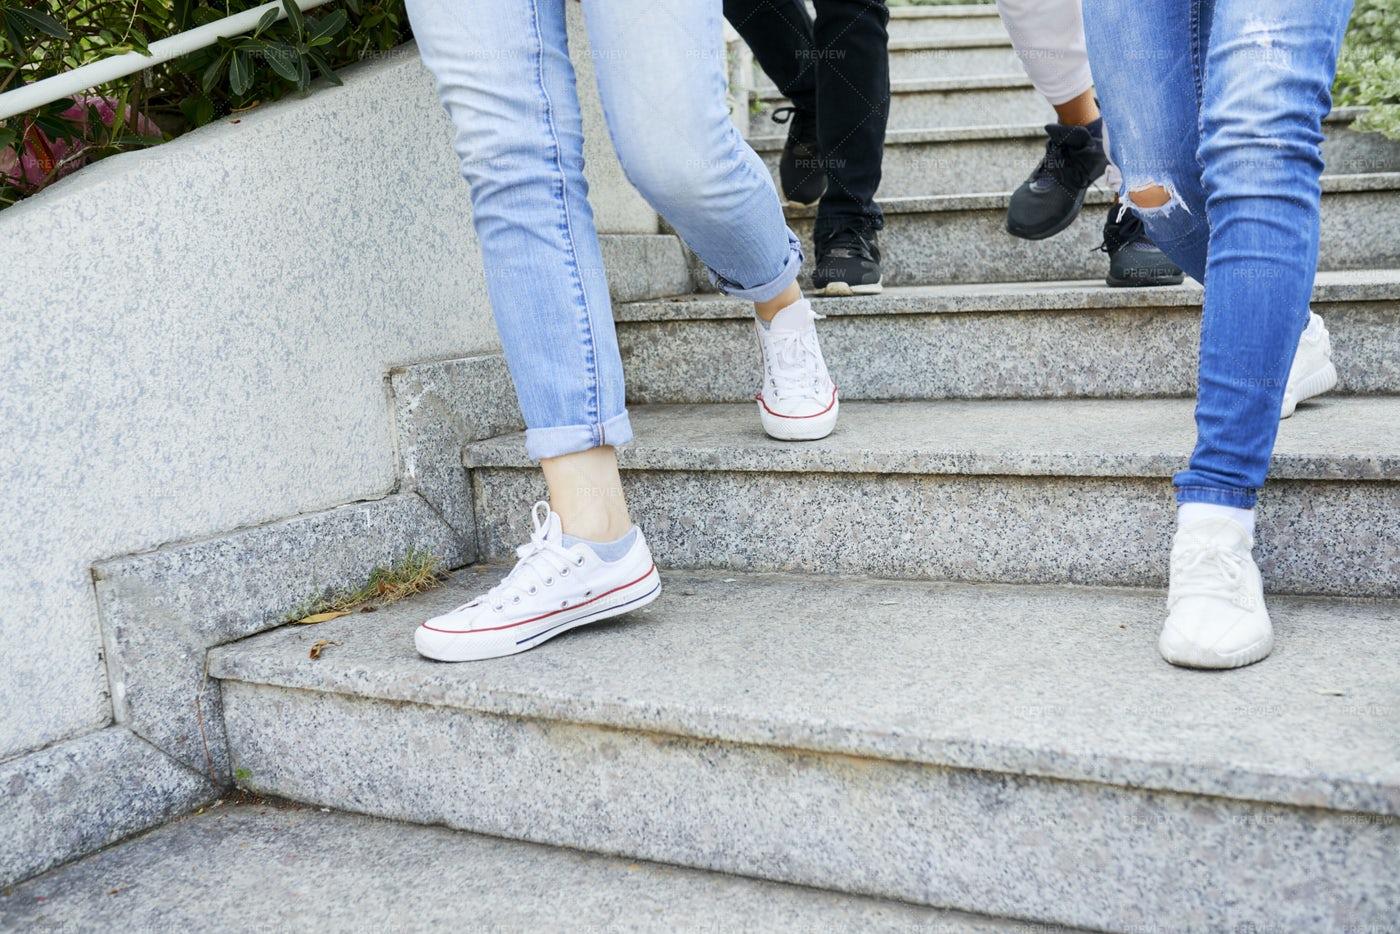 Feet Of Walking People: Stock Photos